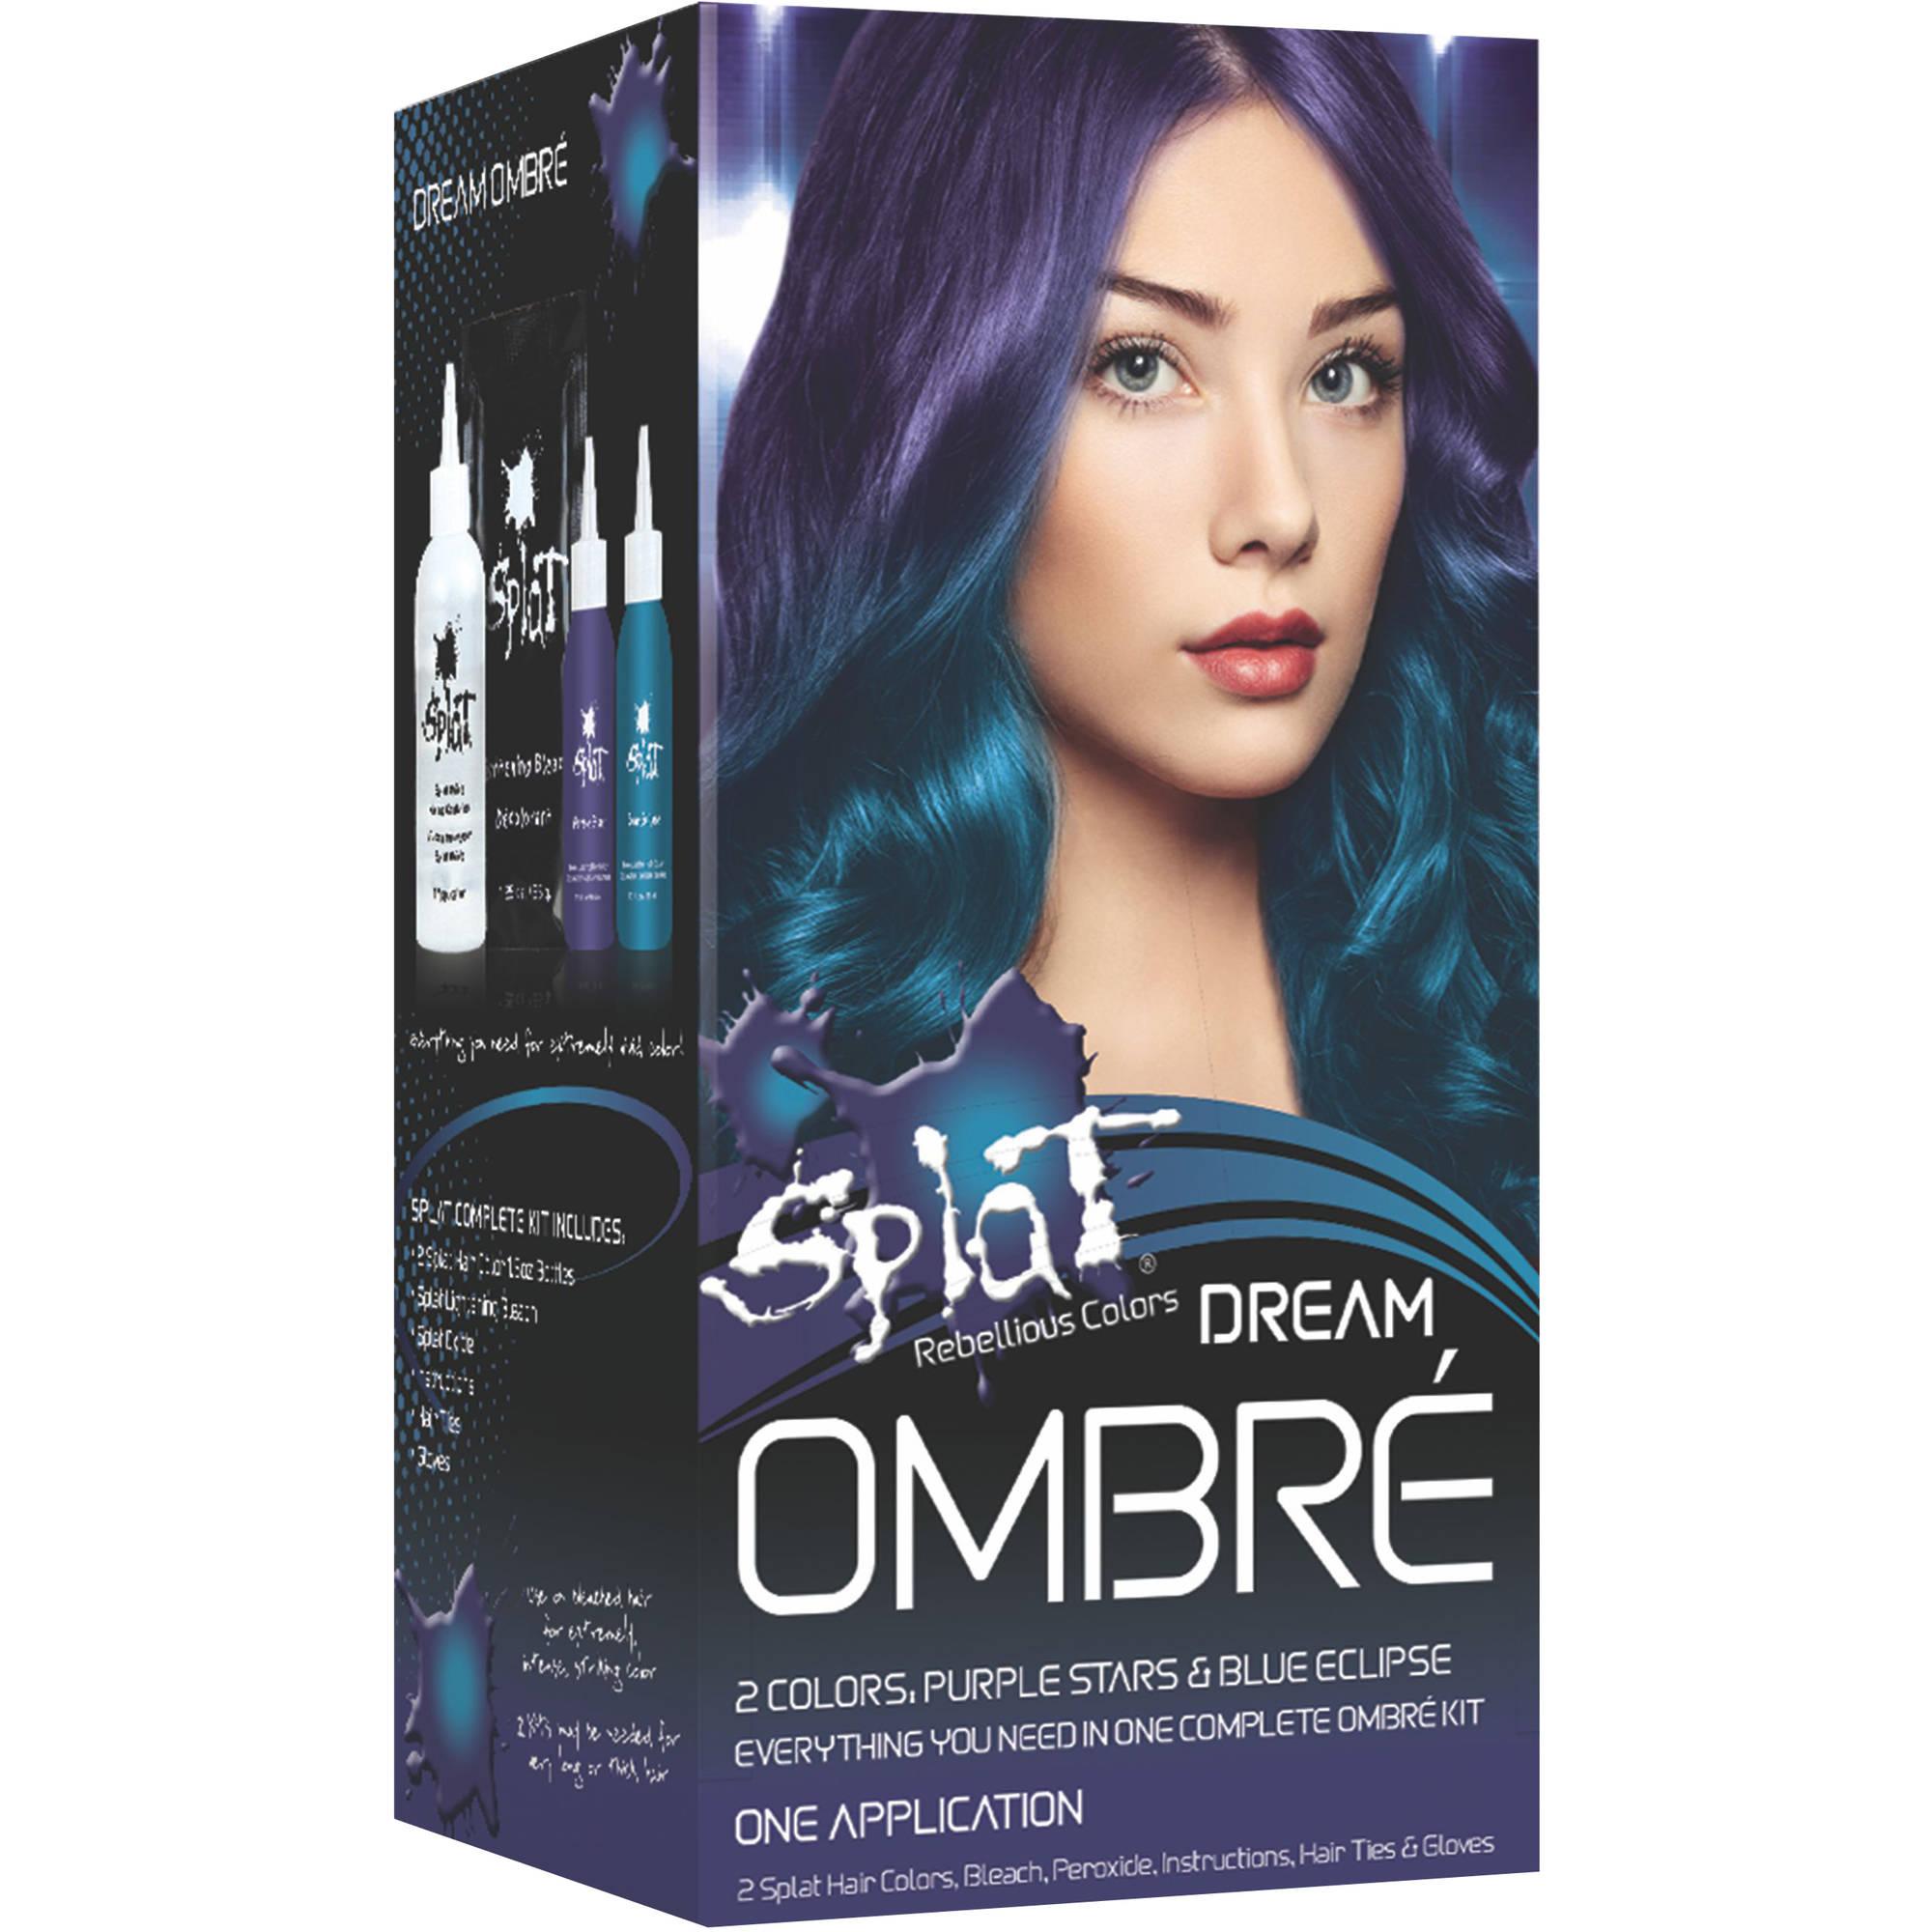 Splat Rebellious Colors Ombre Dream Purple Stars Blue Eclipse